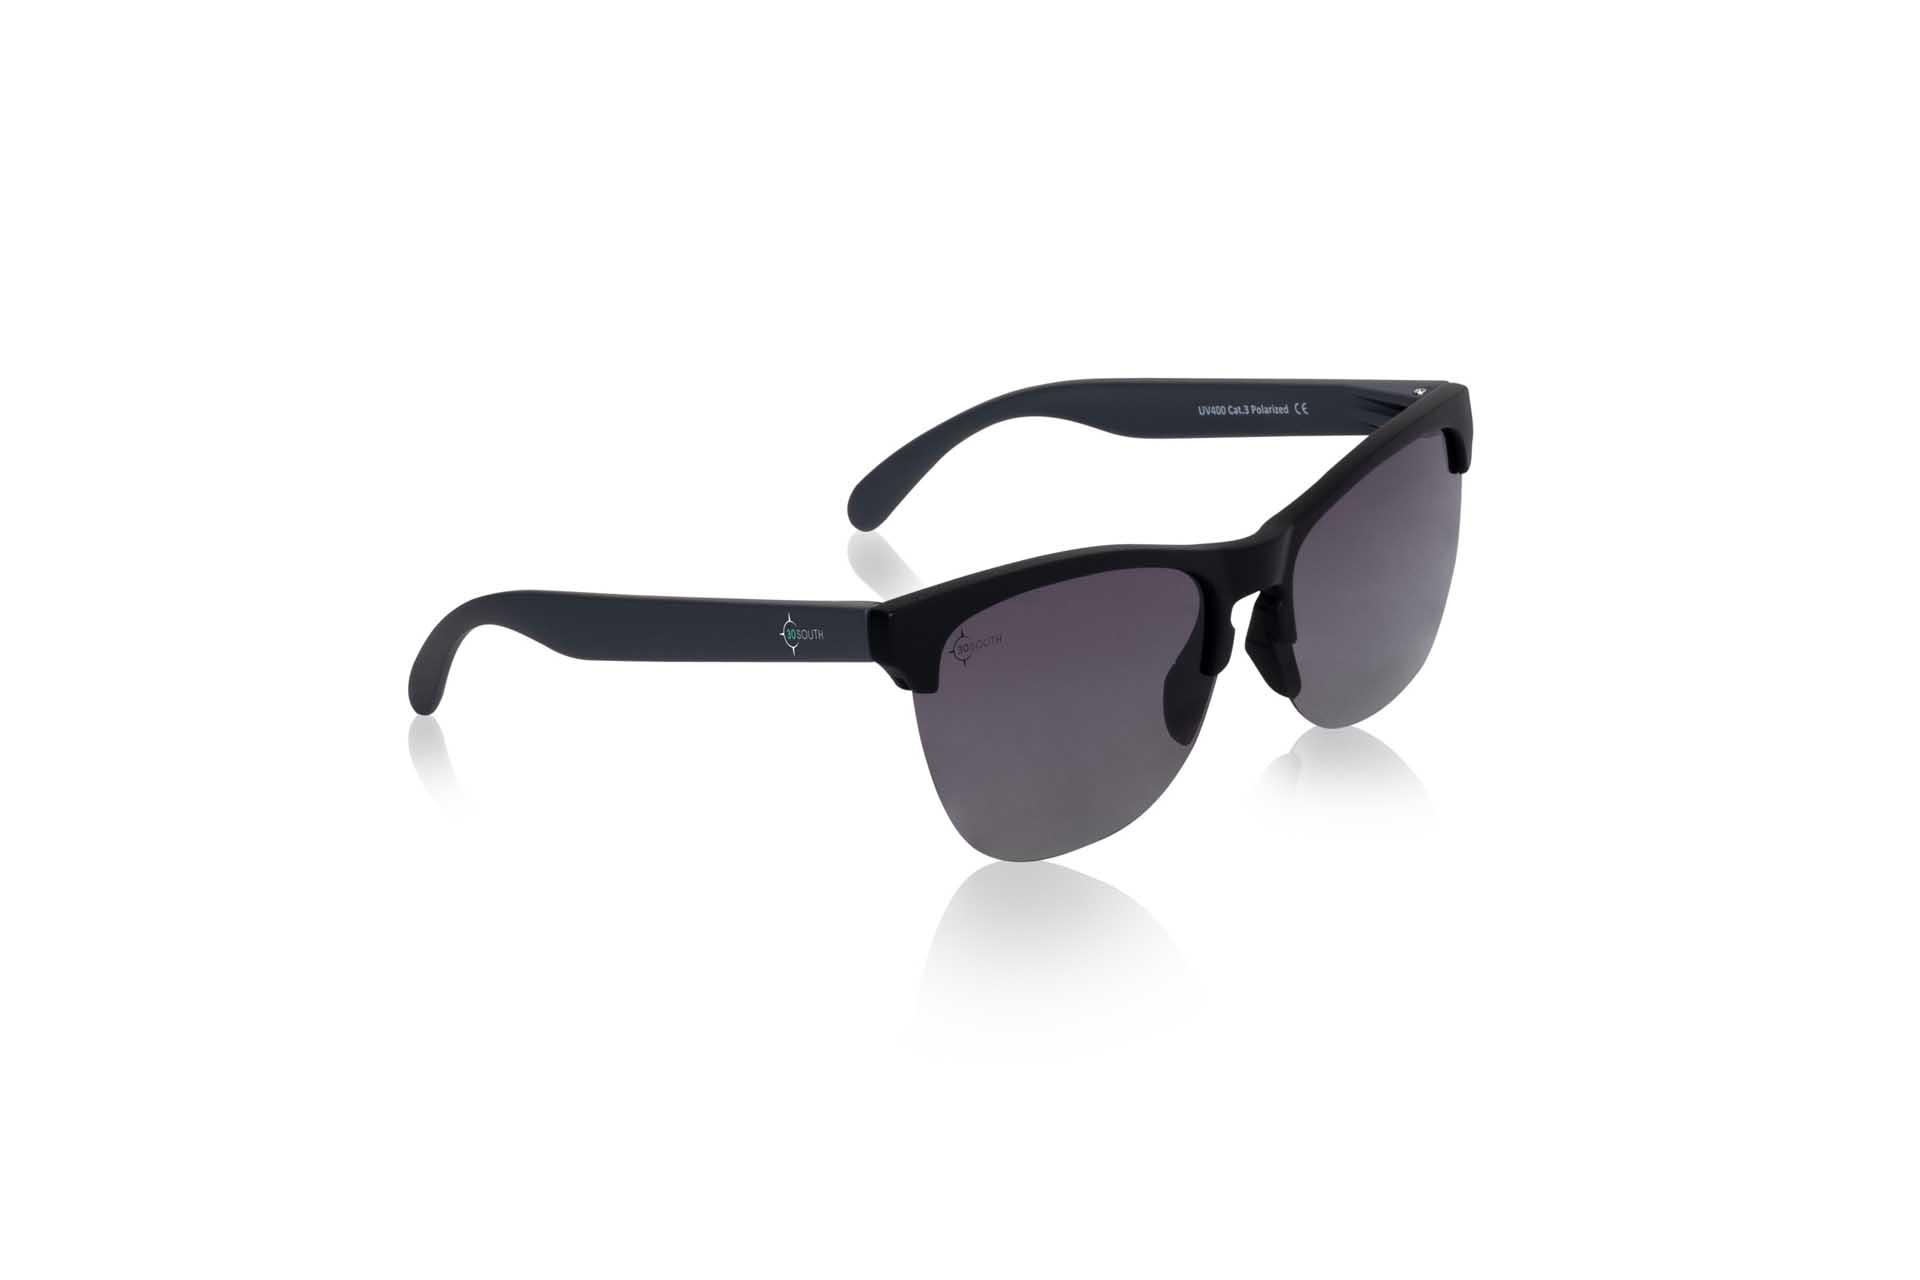 Photo of The Maverick Cavallier sunglasses